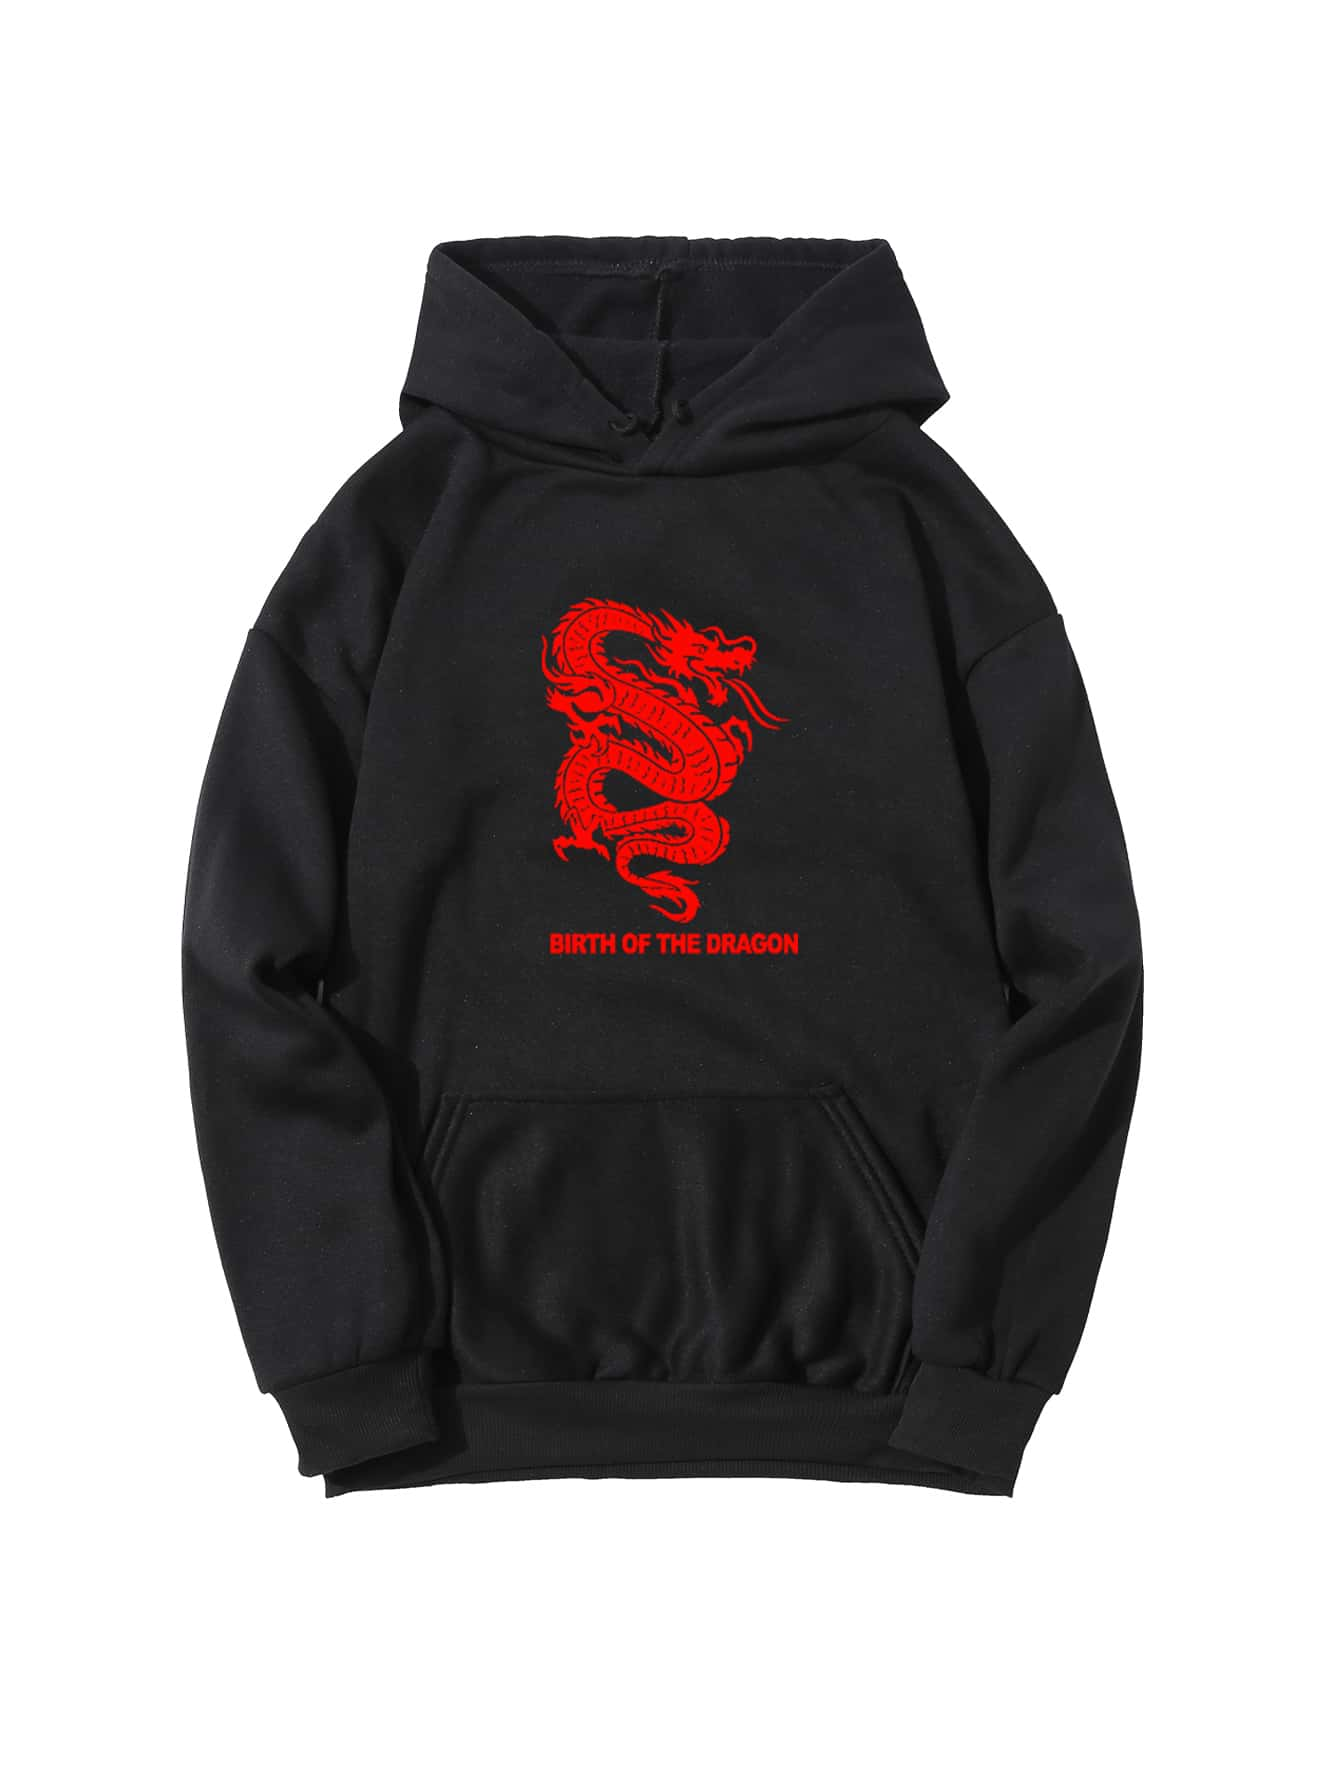 Chinese Dragon & Slogan Graphic Hoodie